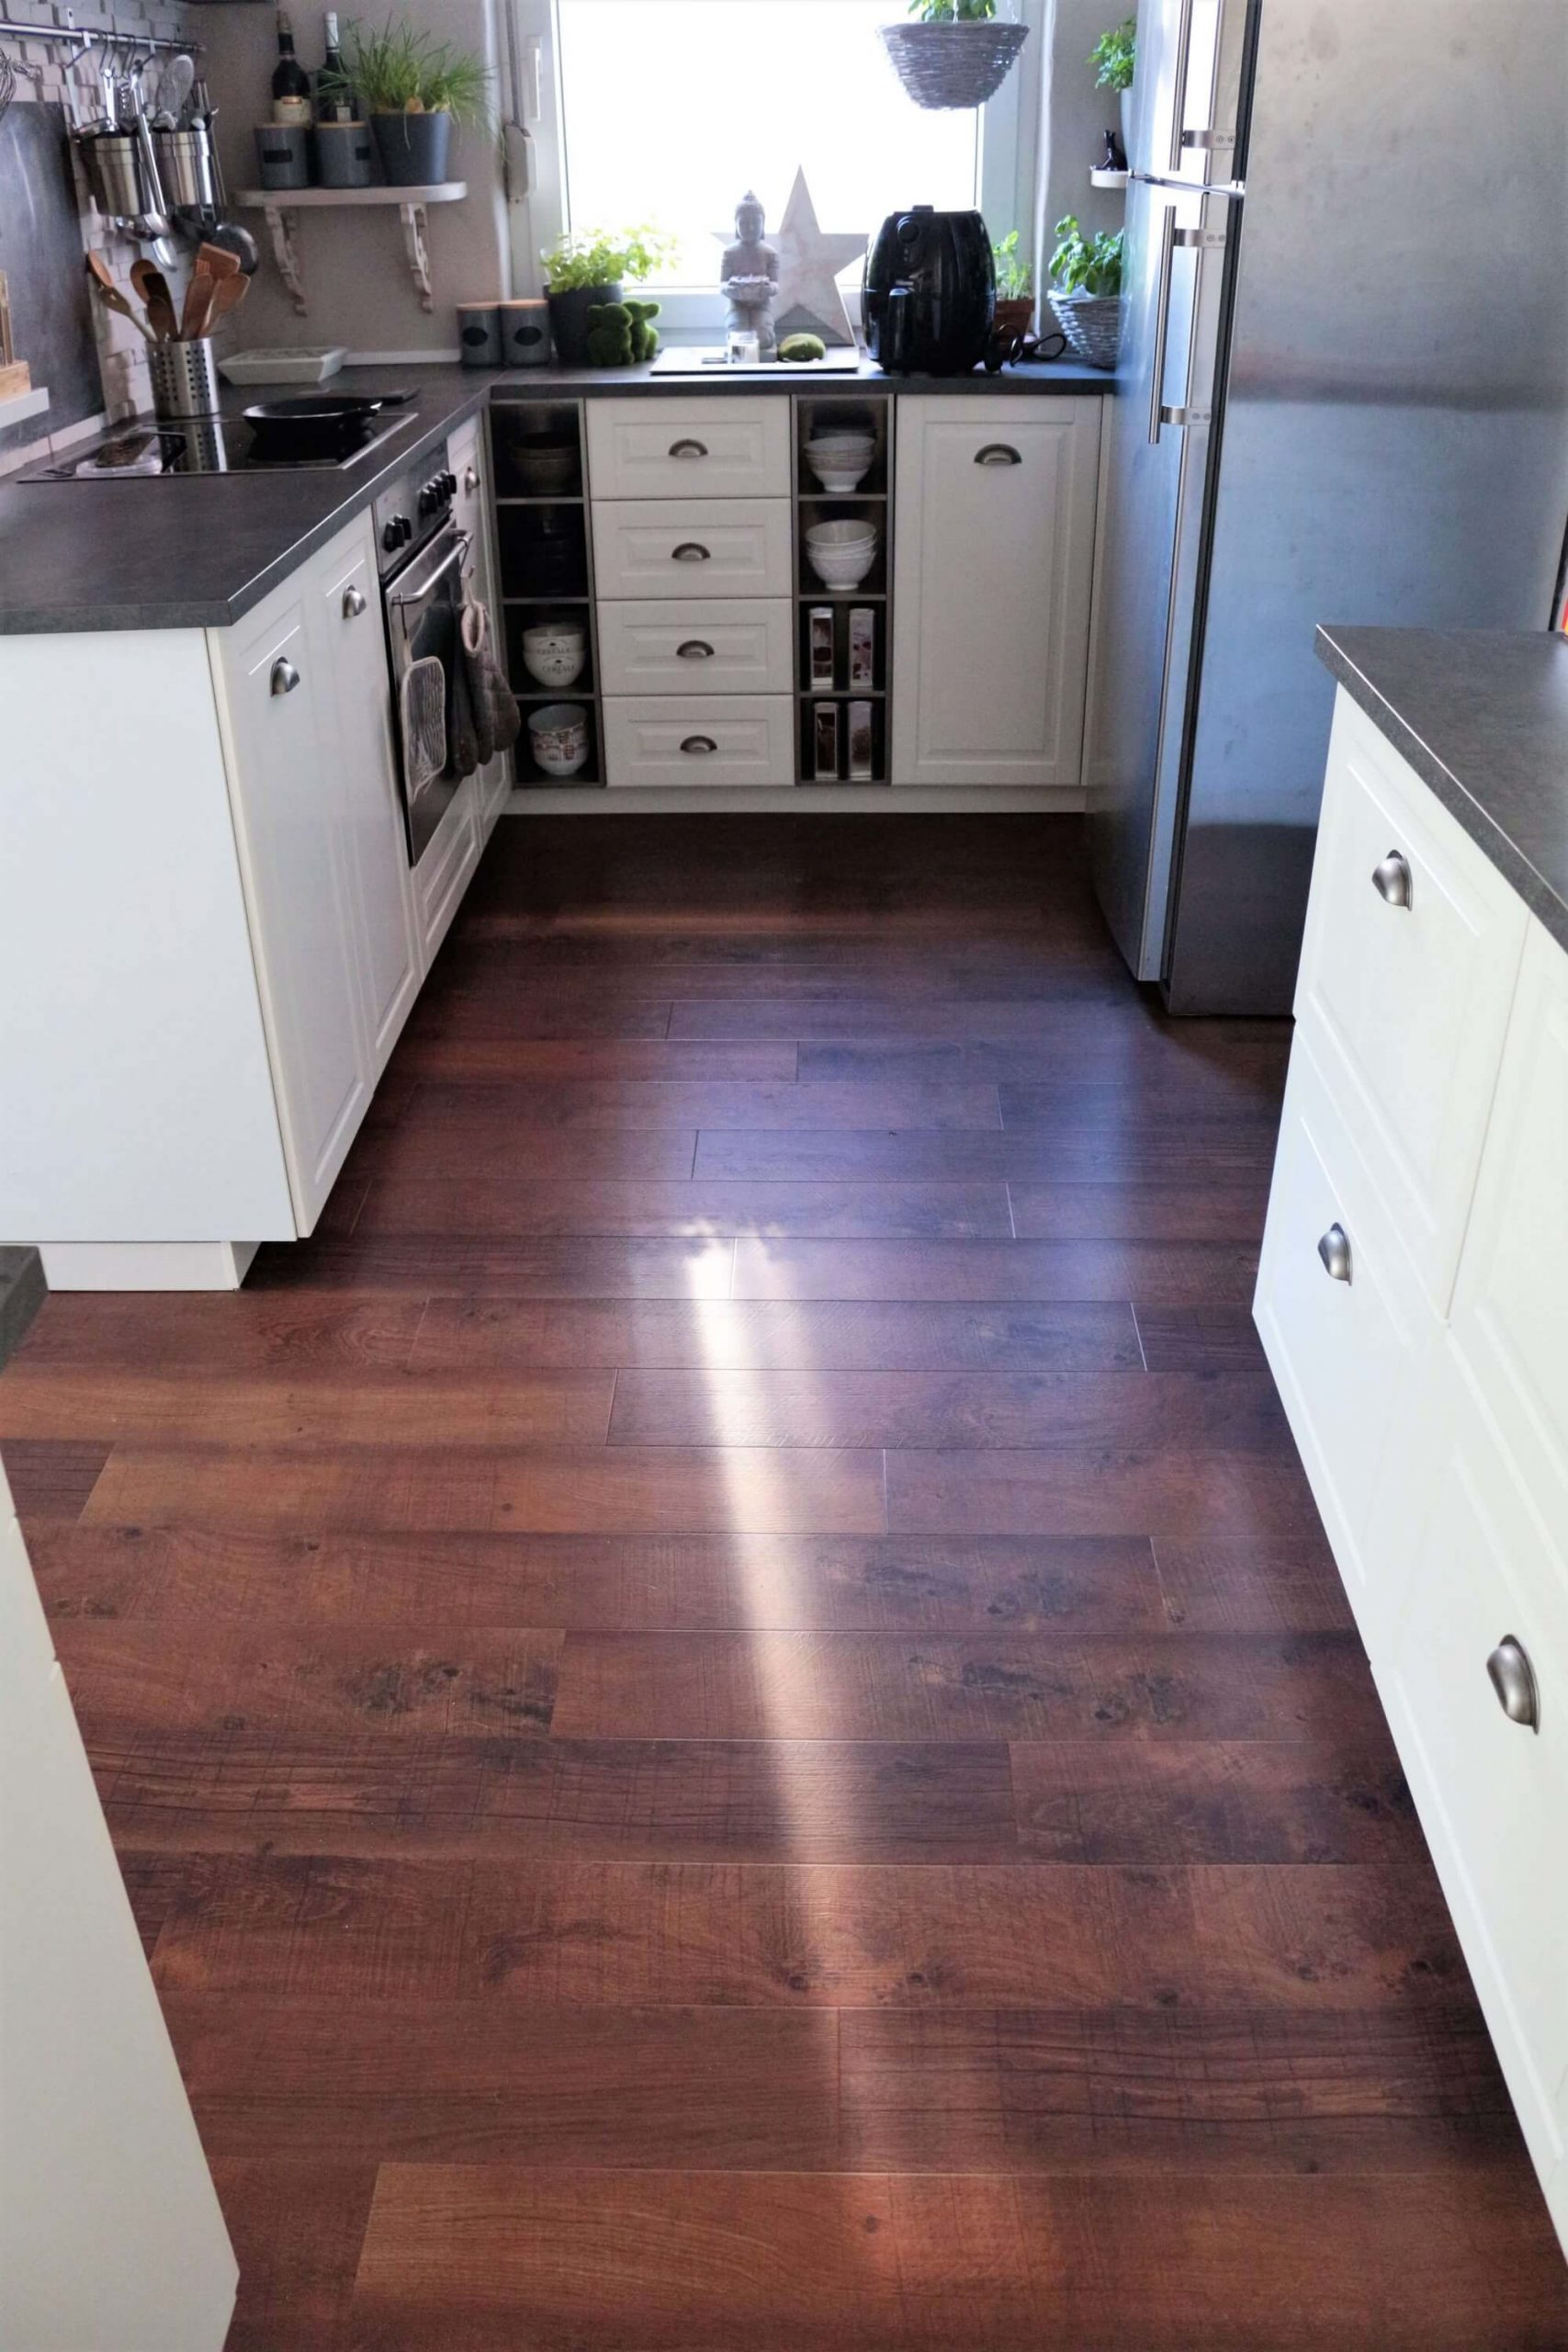 Full Size of Bodenbelag Küche Kaufen Boden In Küche Küche Boden Leiste Welcher Bodenbelag Küche Küche Bodenbelag Küche